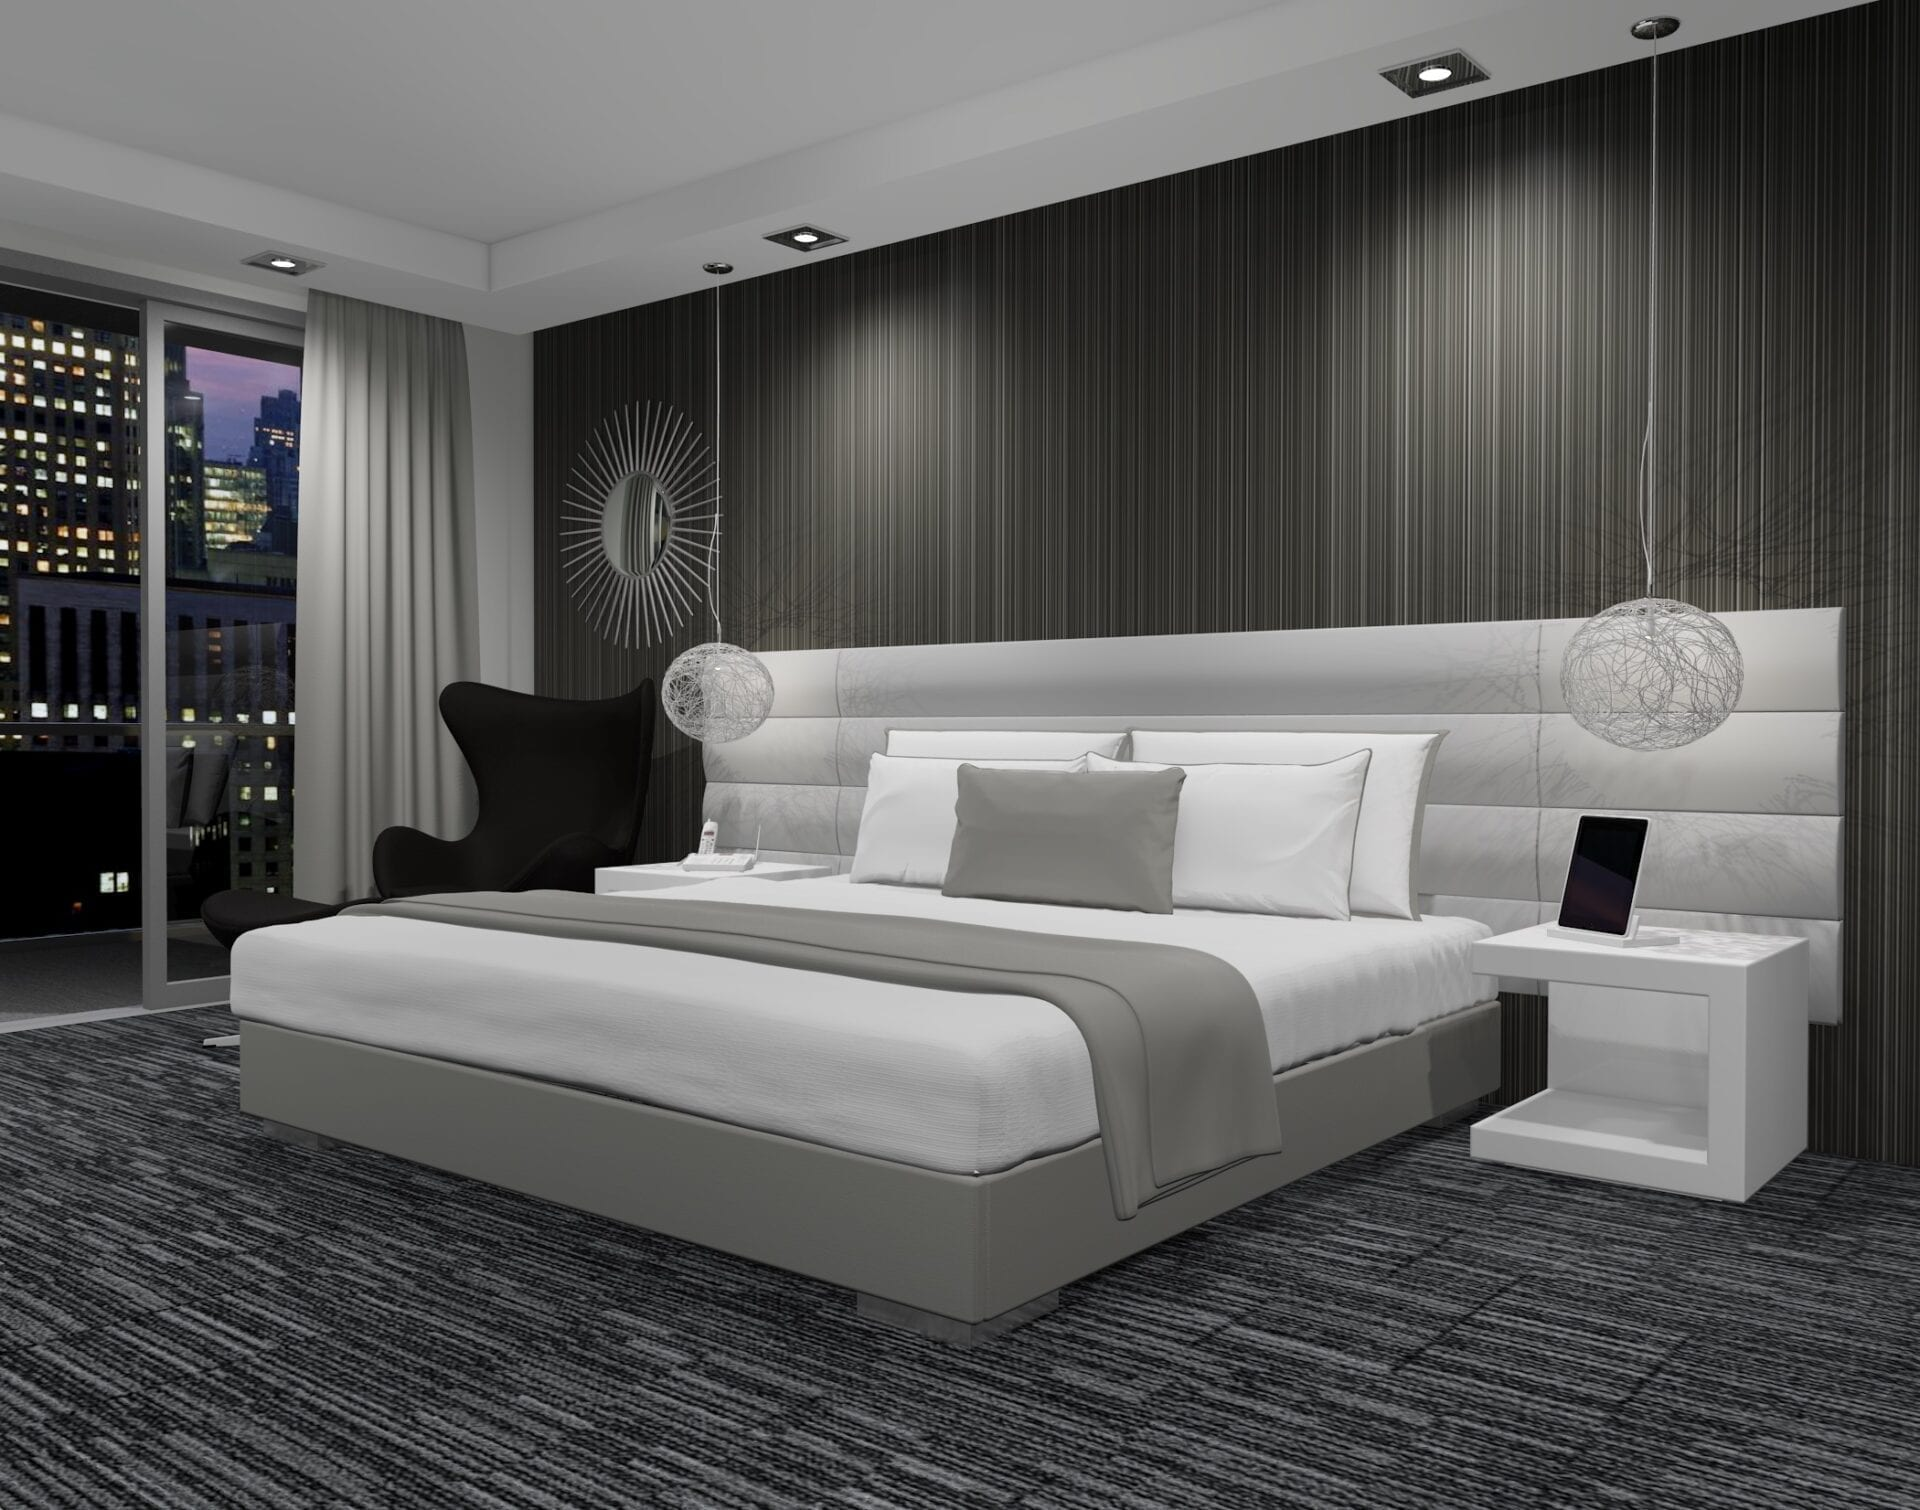 Astoria - Wall mounted upholstered, luxury headboard with custom upholstered wall panels - Custom luxury, upholstered beds with high end, bedroom textiles | Blend Home Furnishings